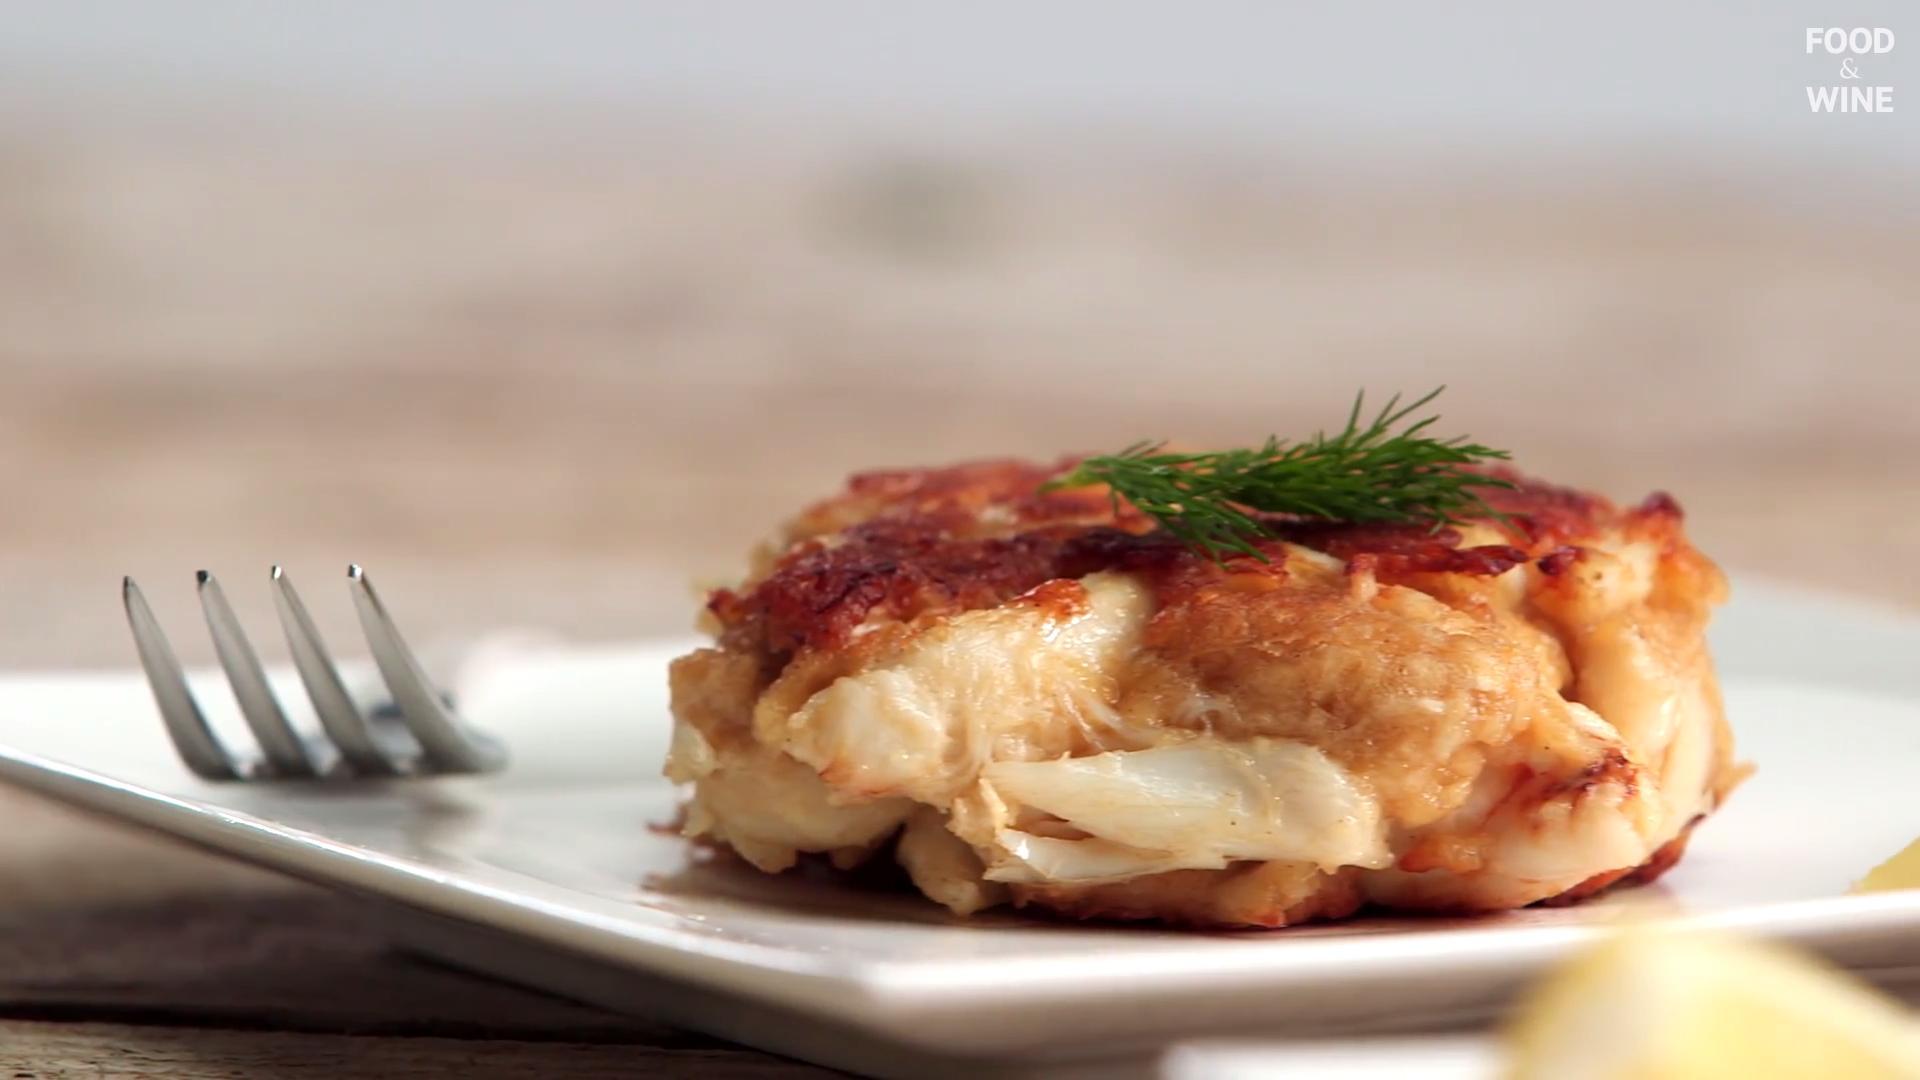 Starkist crab cake recipe